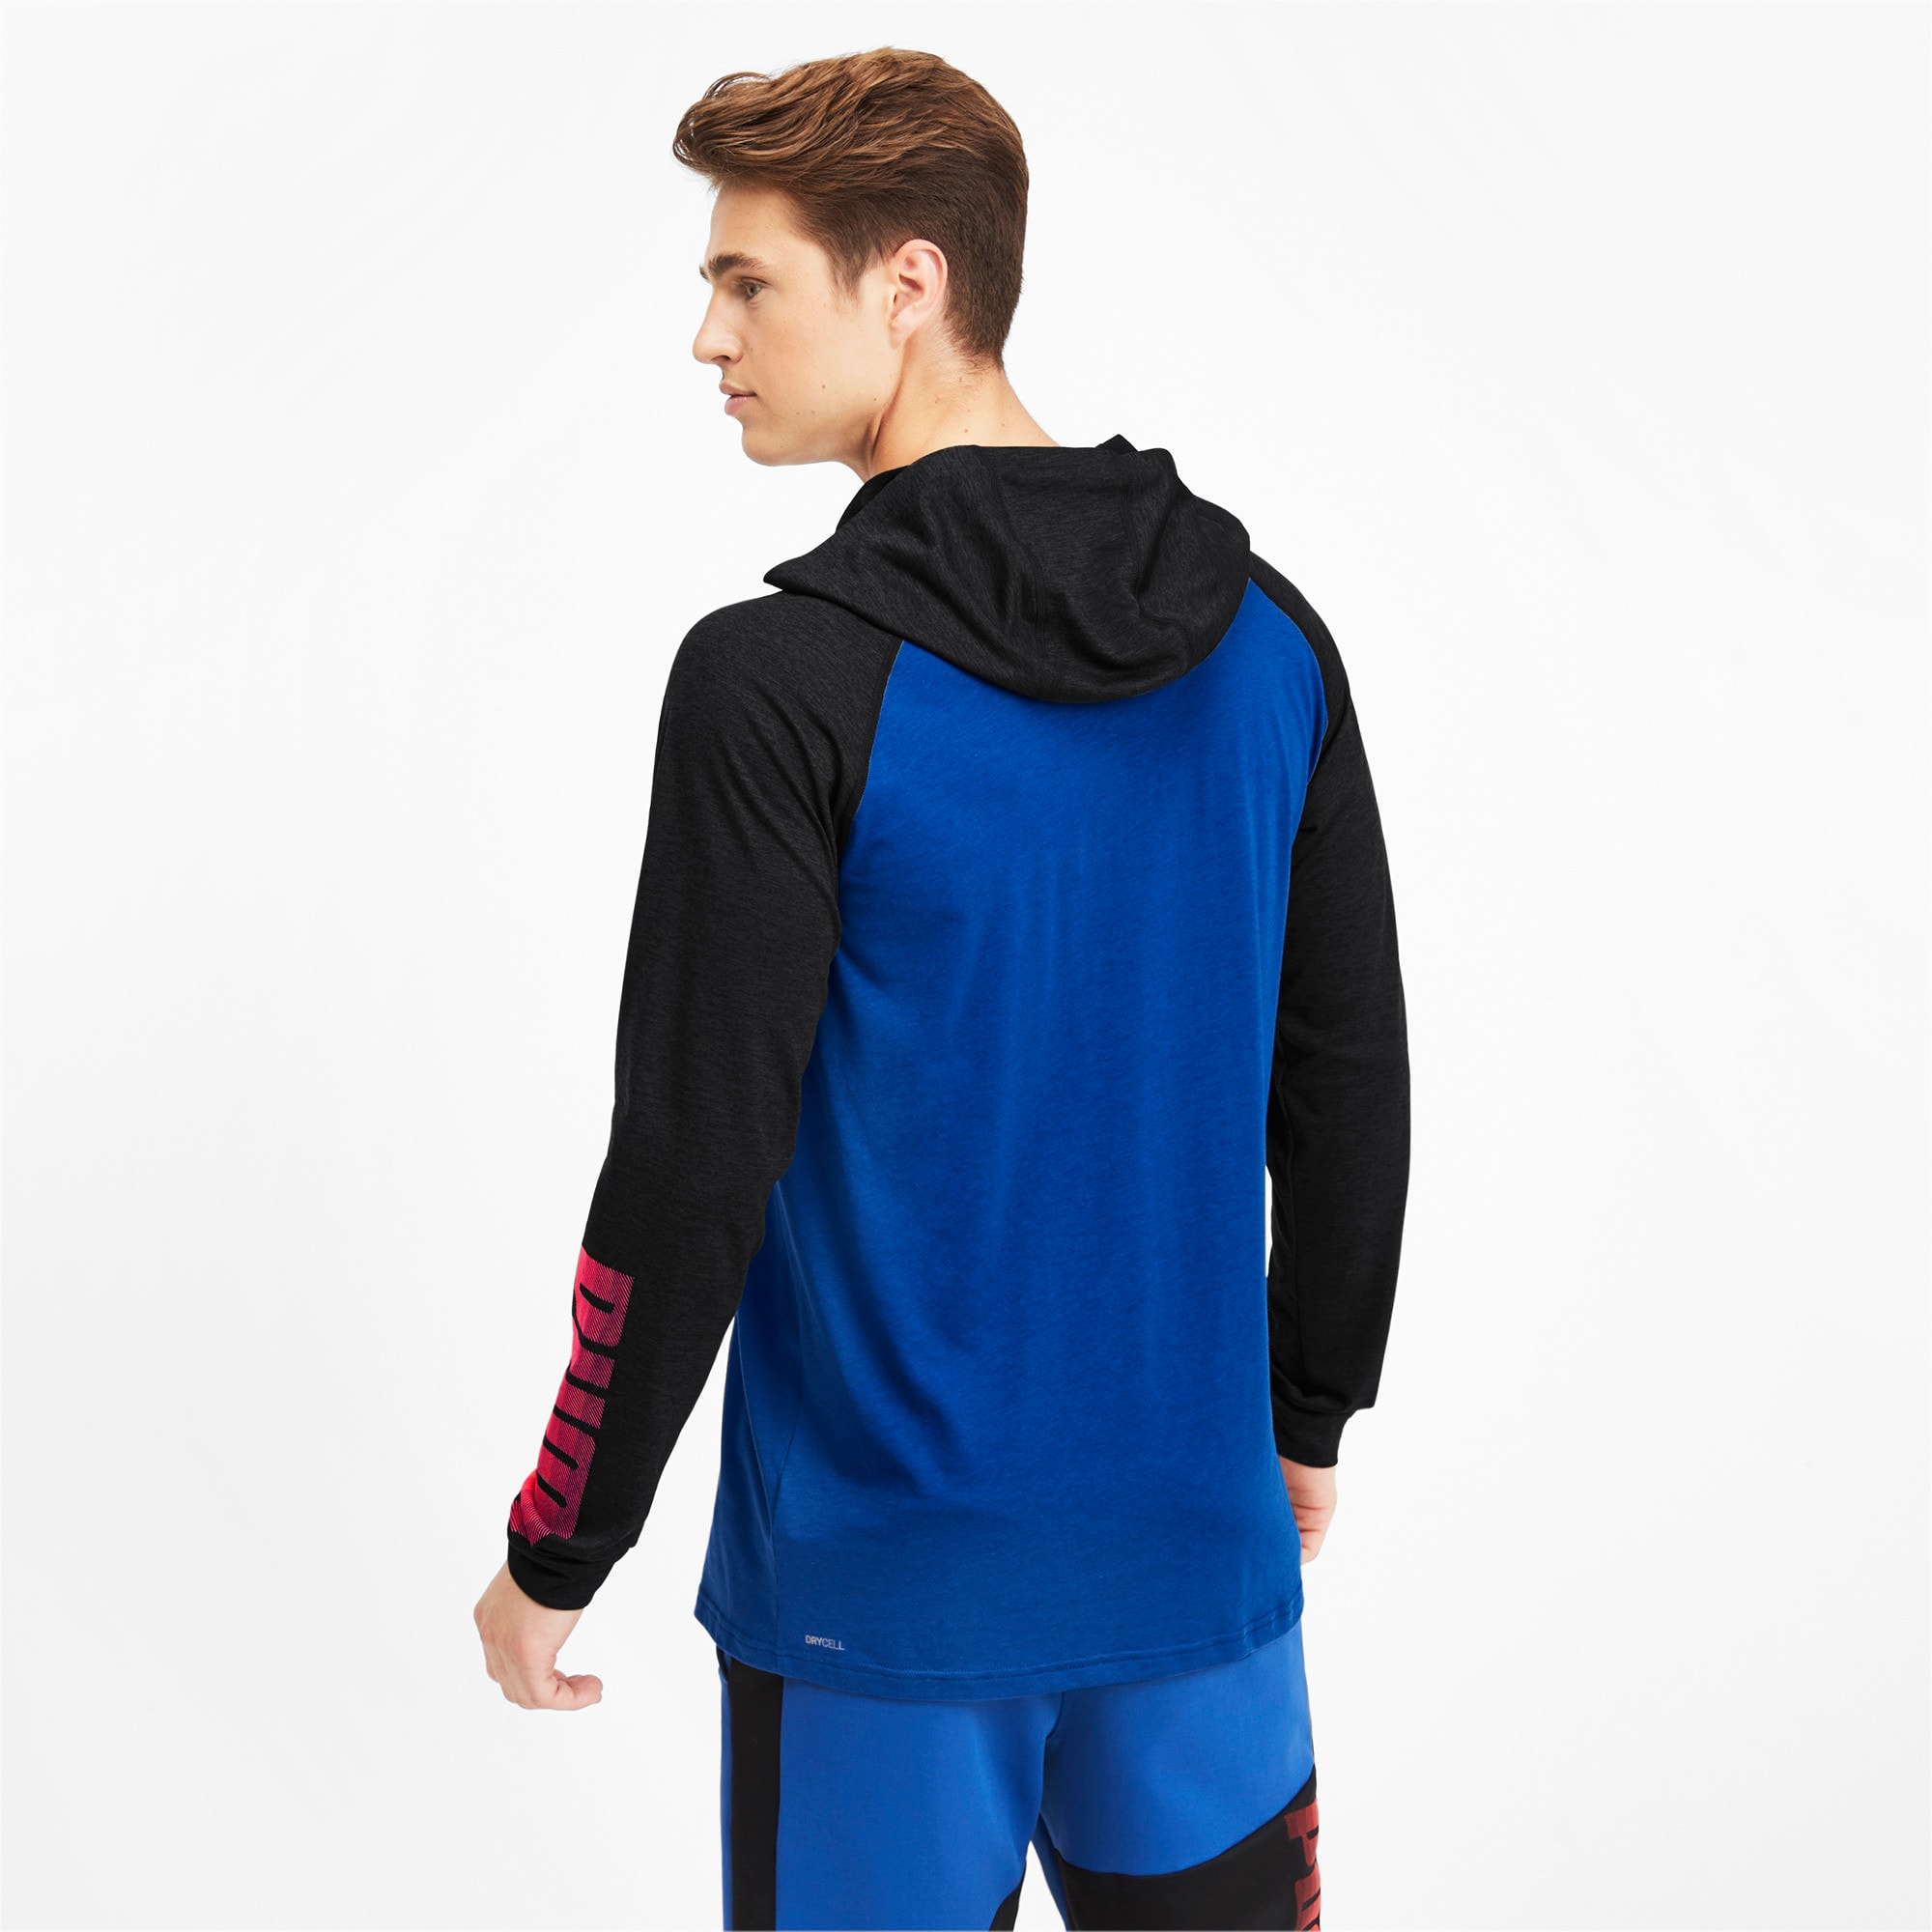 Thumbnail 3 of Collective Men's Long Sleeve Hooded Tee, Galaxy Blue-Black Heather, medium